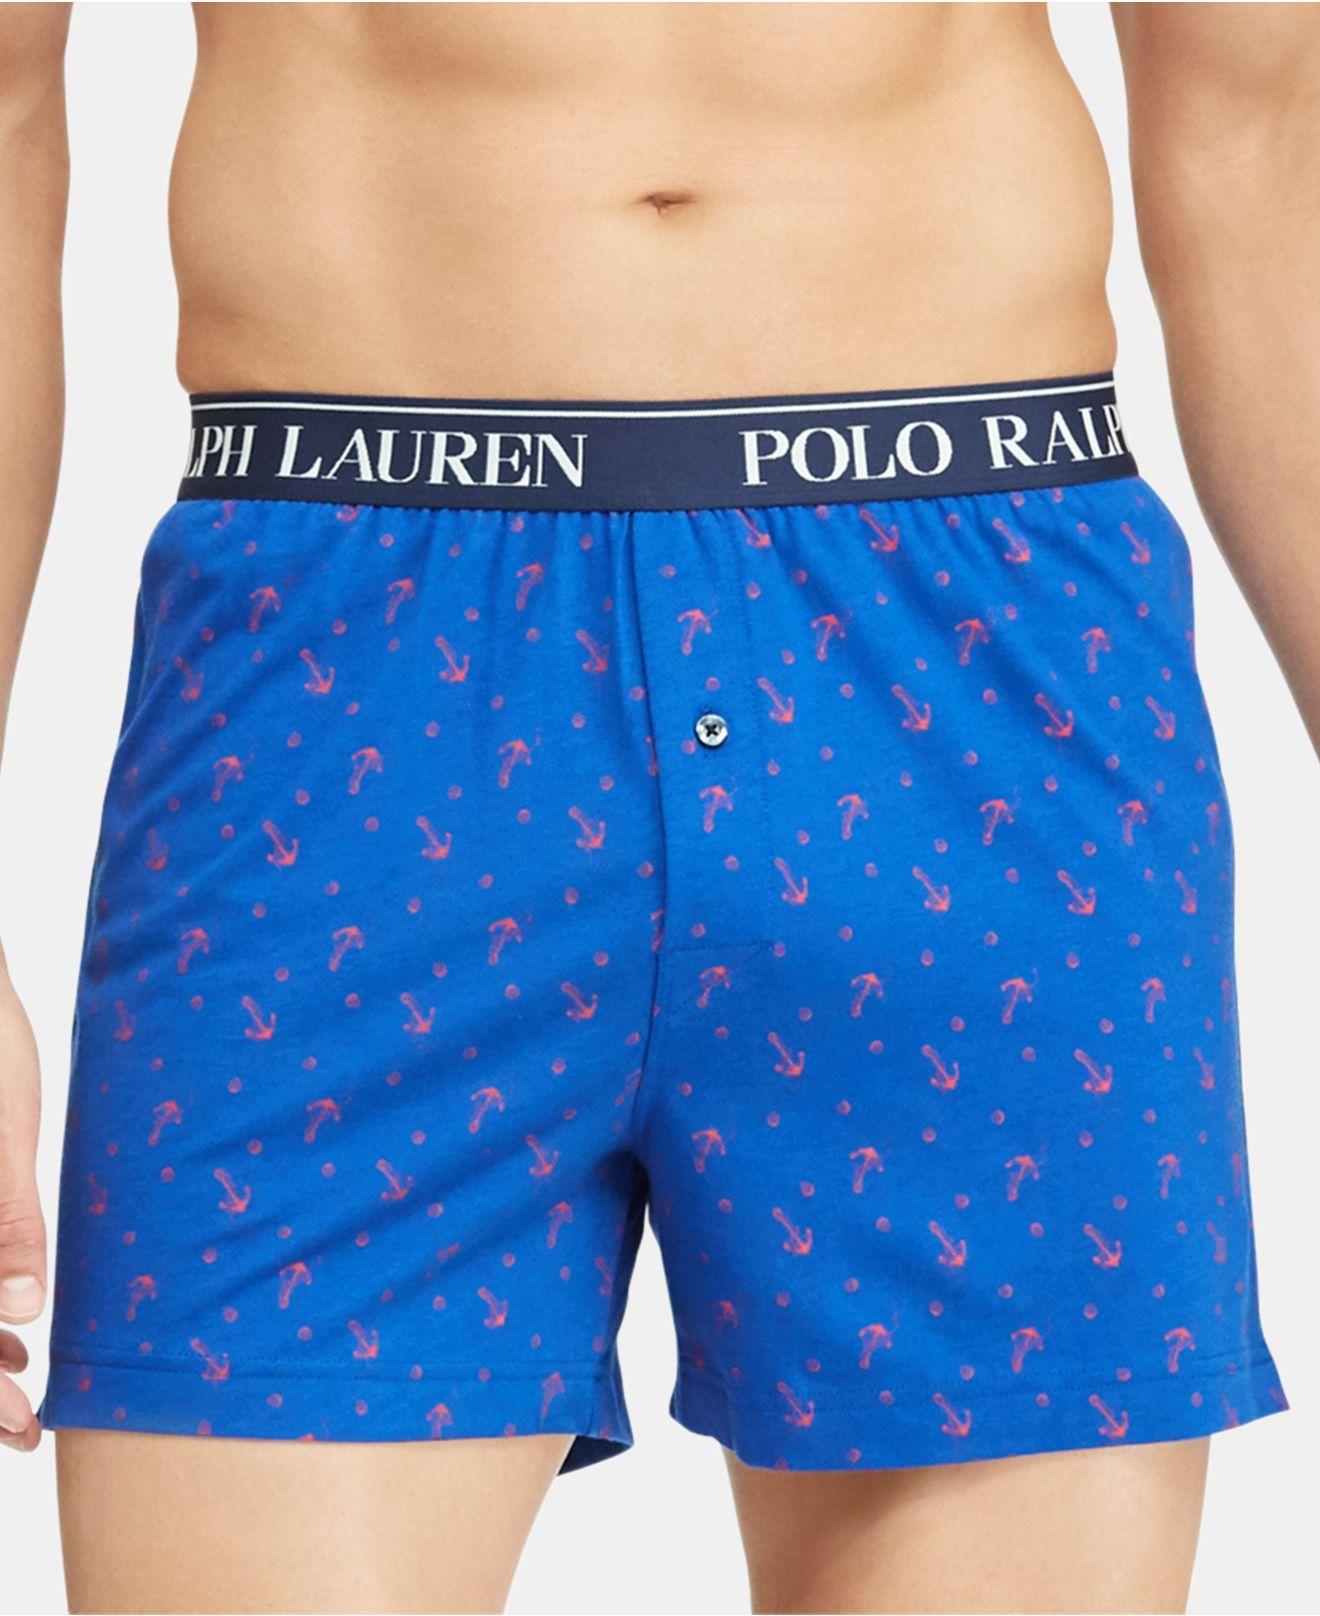 b8b108b1d48 Lyst - Polo Ralph Lauren Knit Boxers in Blue for Men